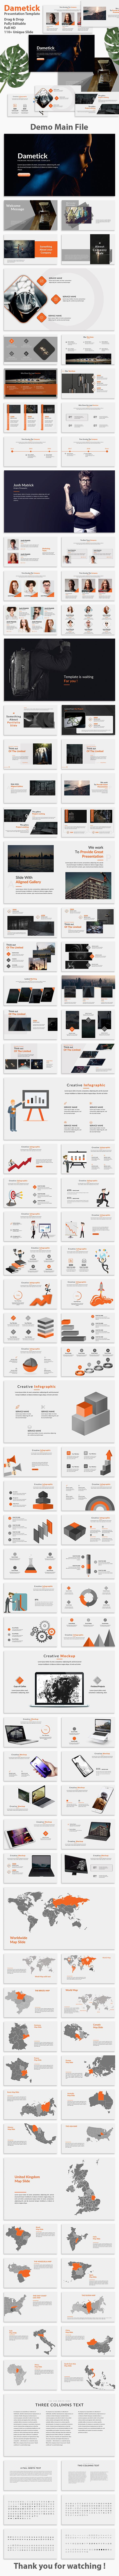 Dametick Premium PowerPoint Template - Creative PowerPoint Templates